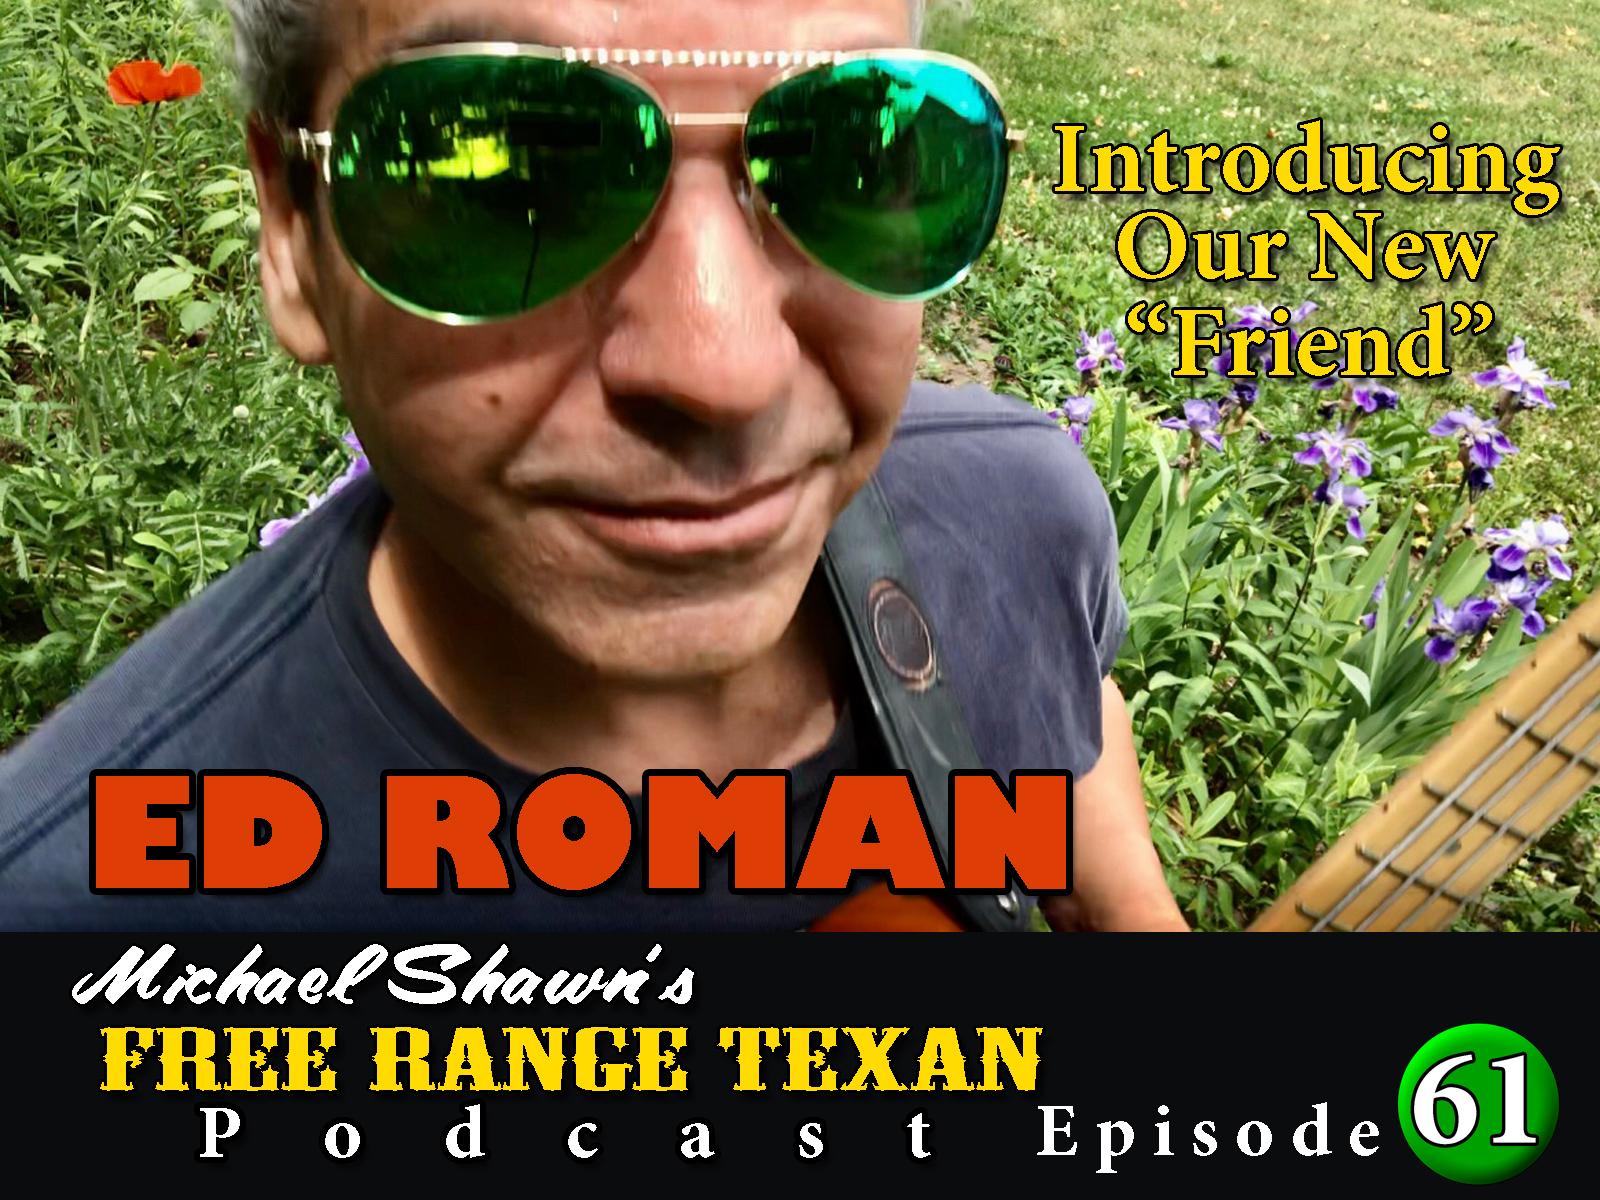 Free Range Texan Podcast Episode 61